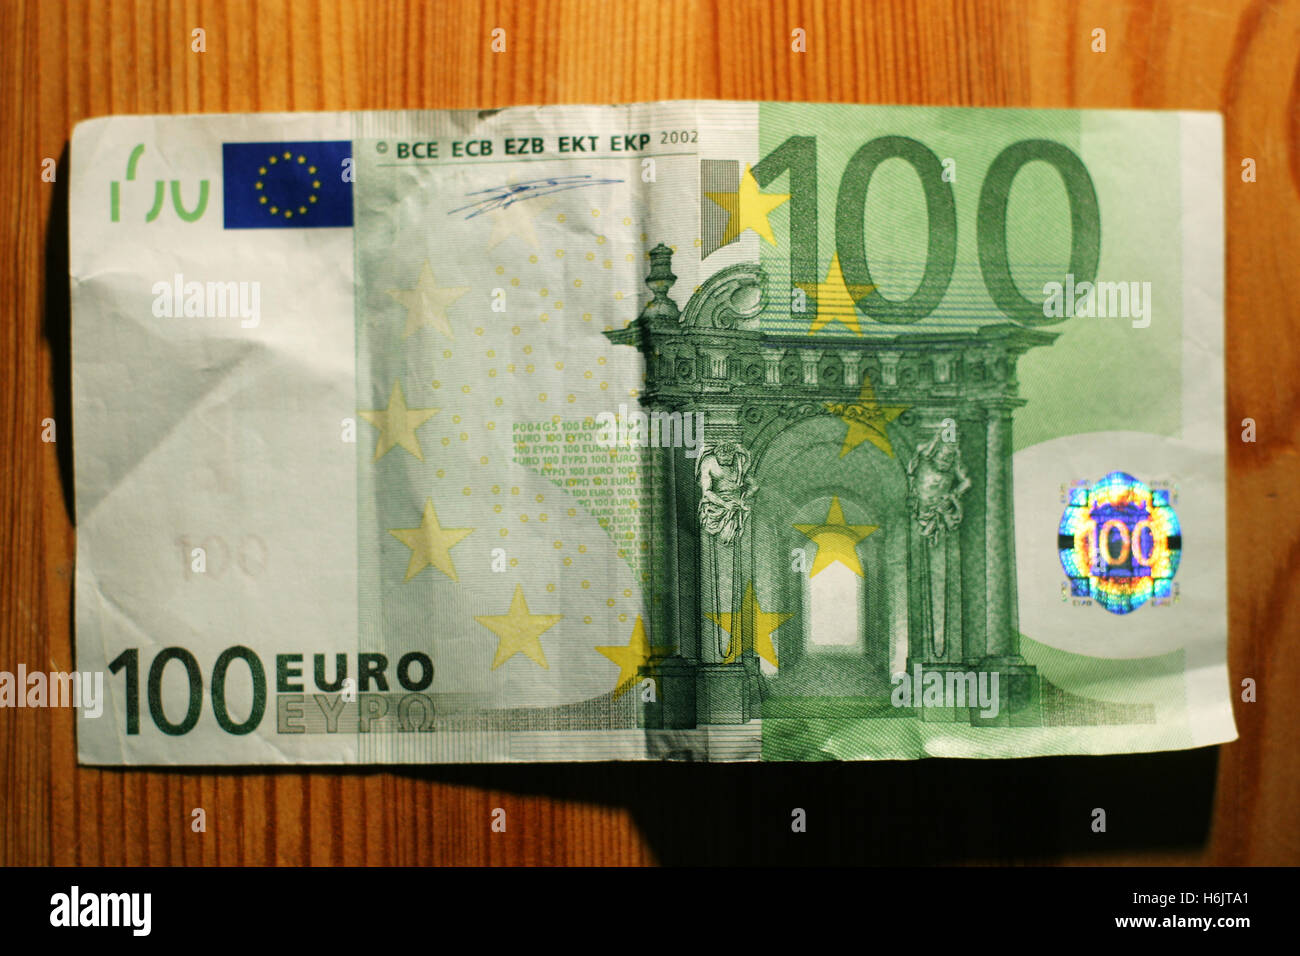 one hundred euro note - Stock Image